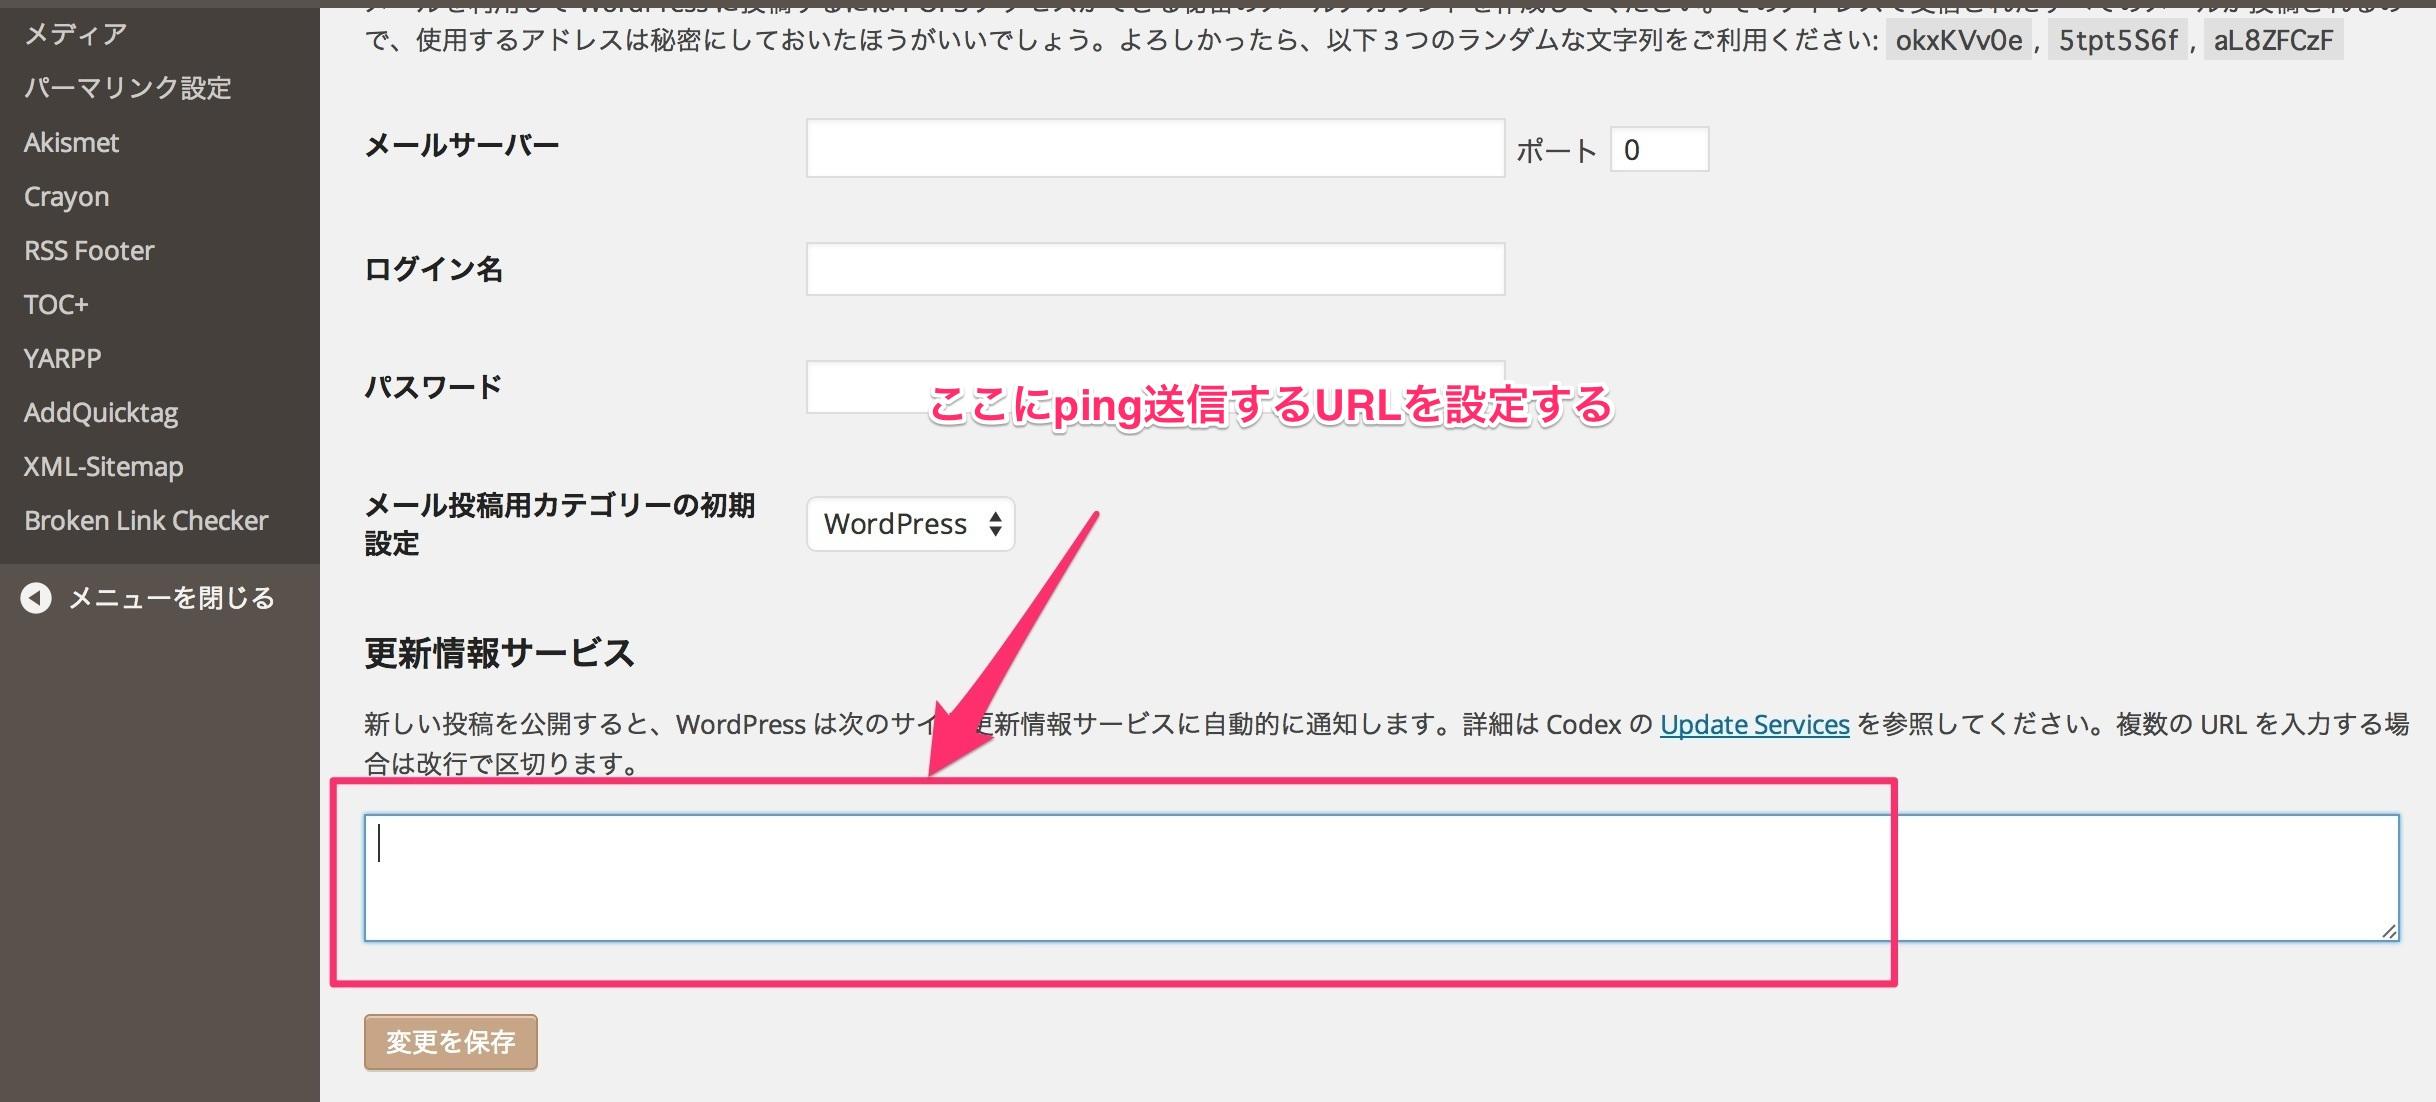 WordPress ping送信設定入力欄